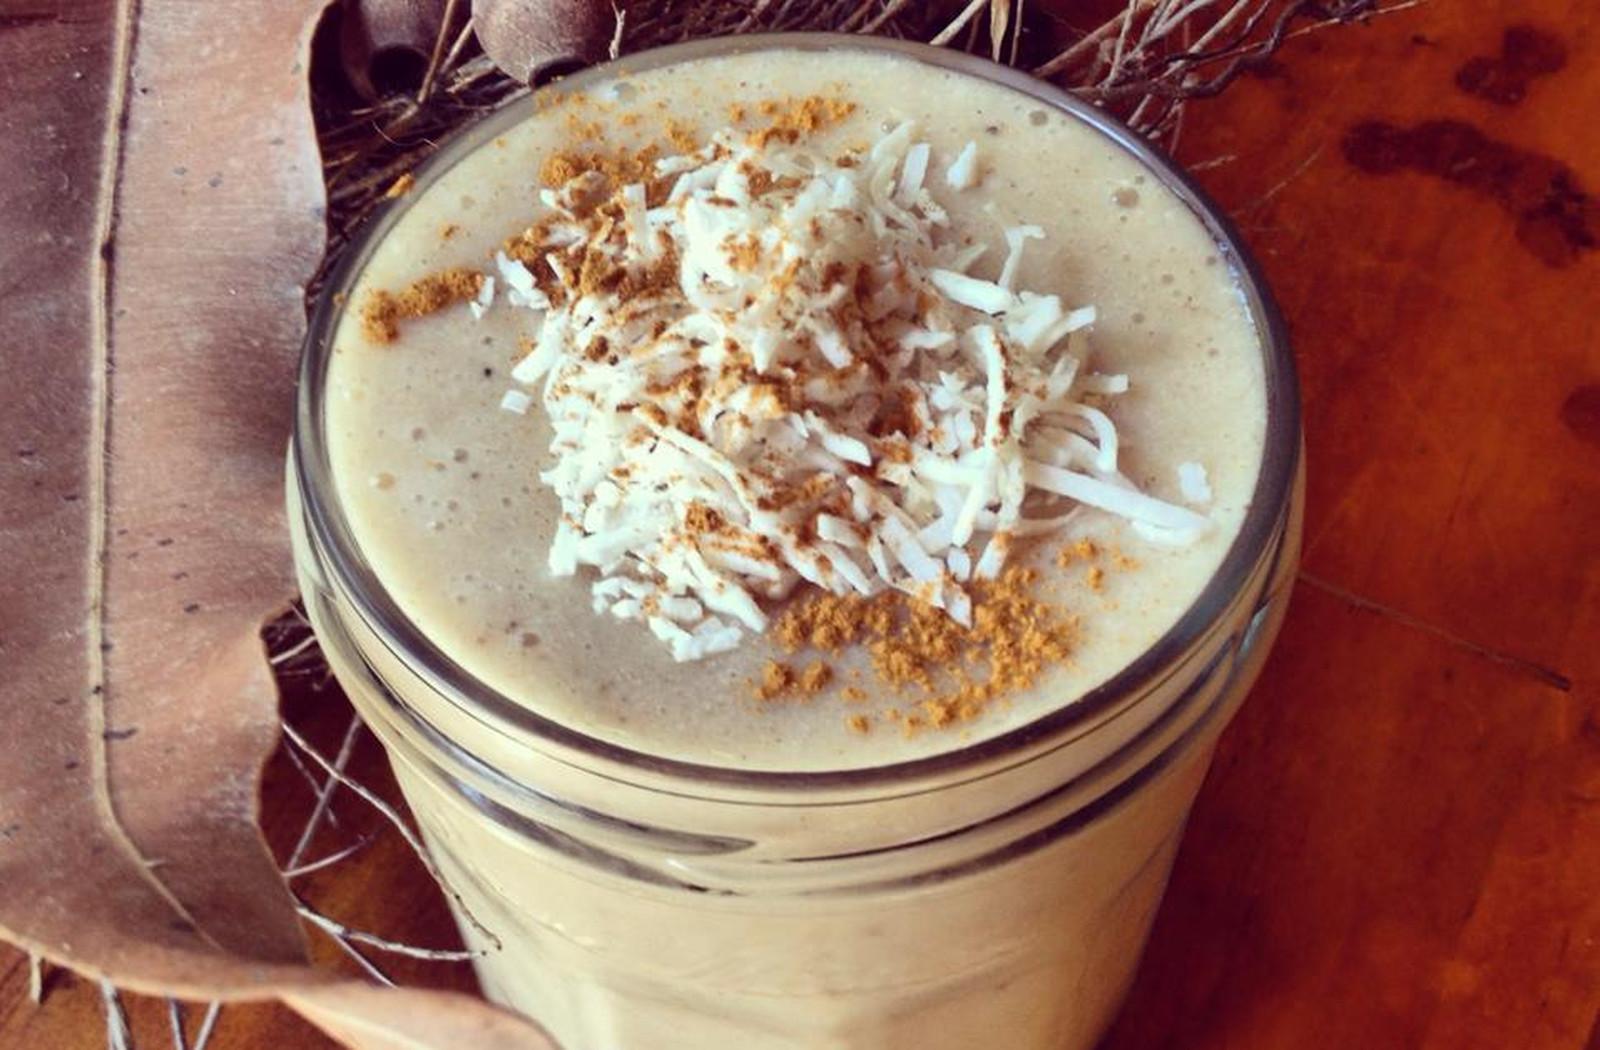 Nourishing Autumn Chai Smoothie [Vegan, Gluten-Free]